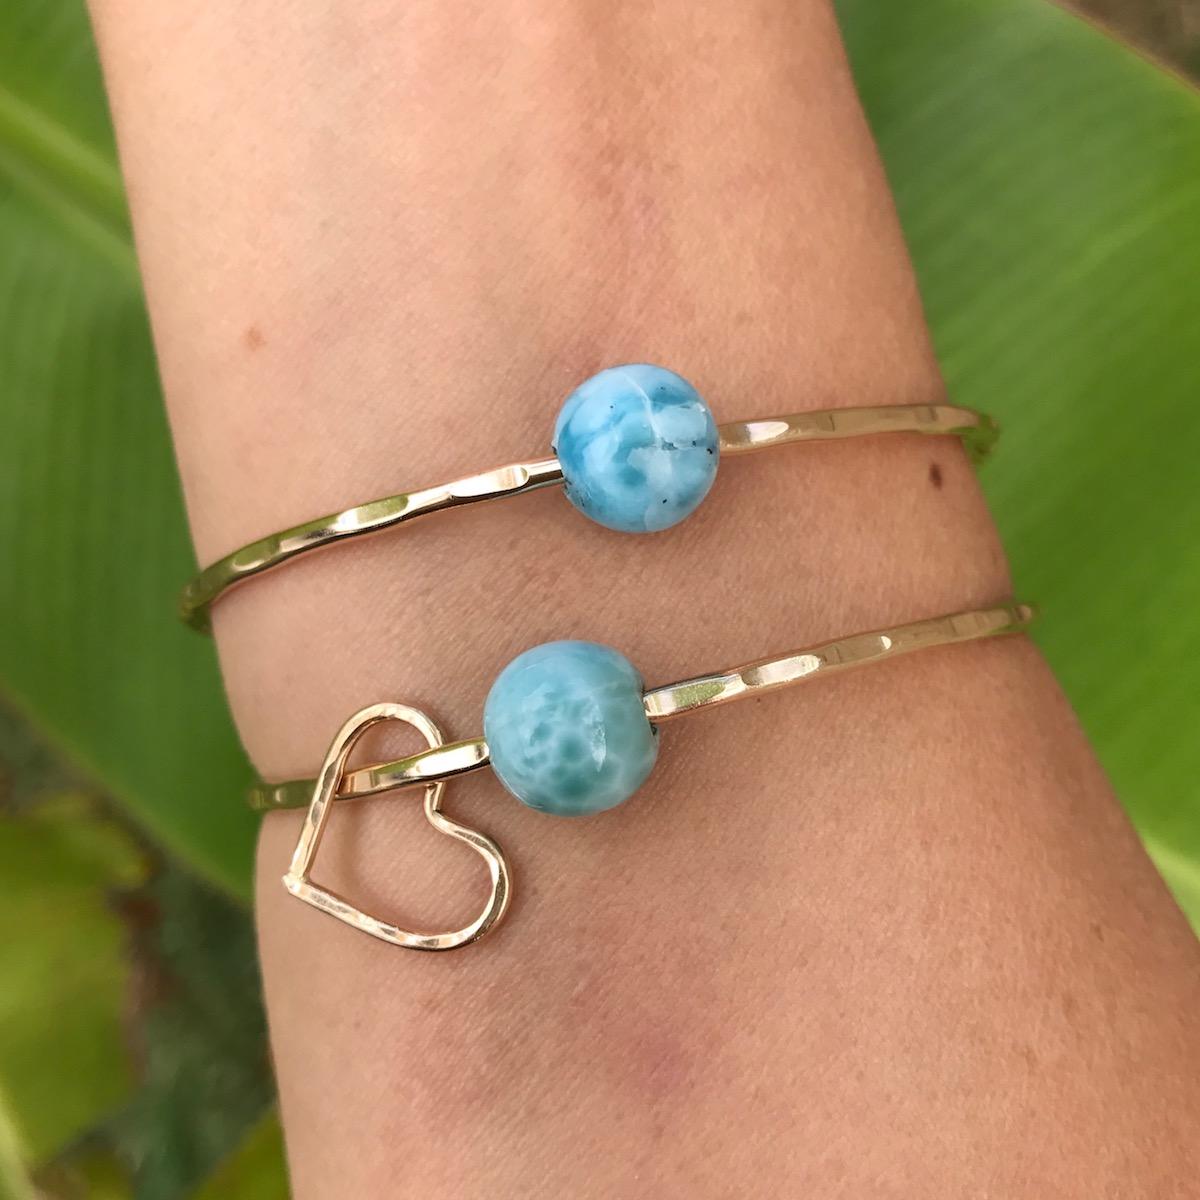 Caribbean Blue Larimar Bangle Bracelet Aloha Bangles